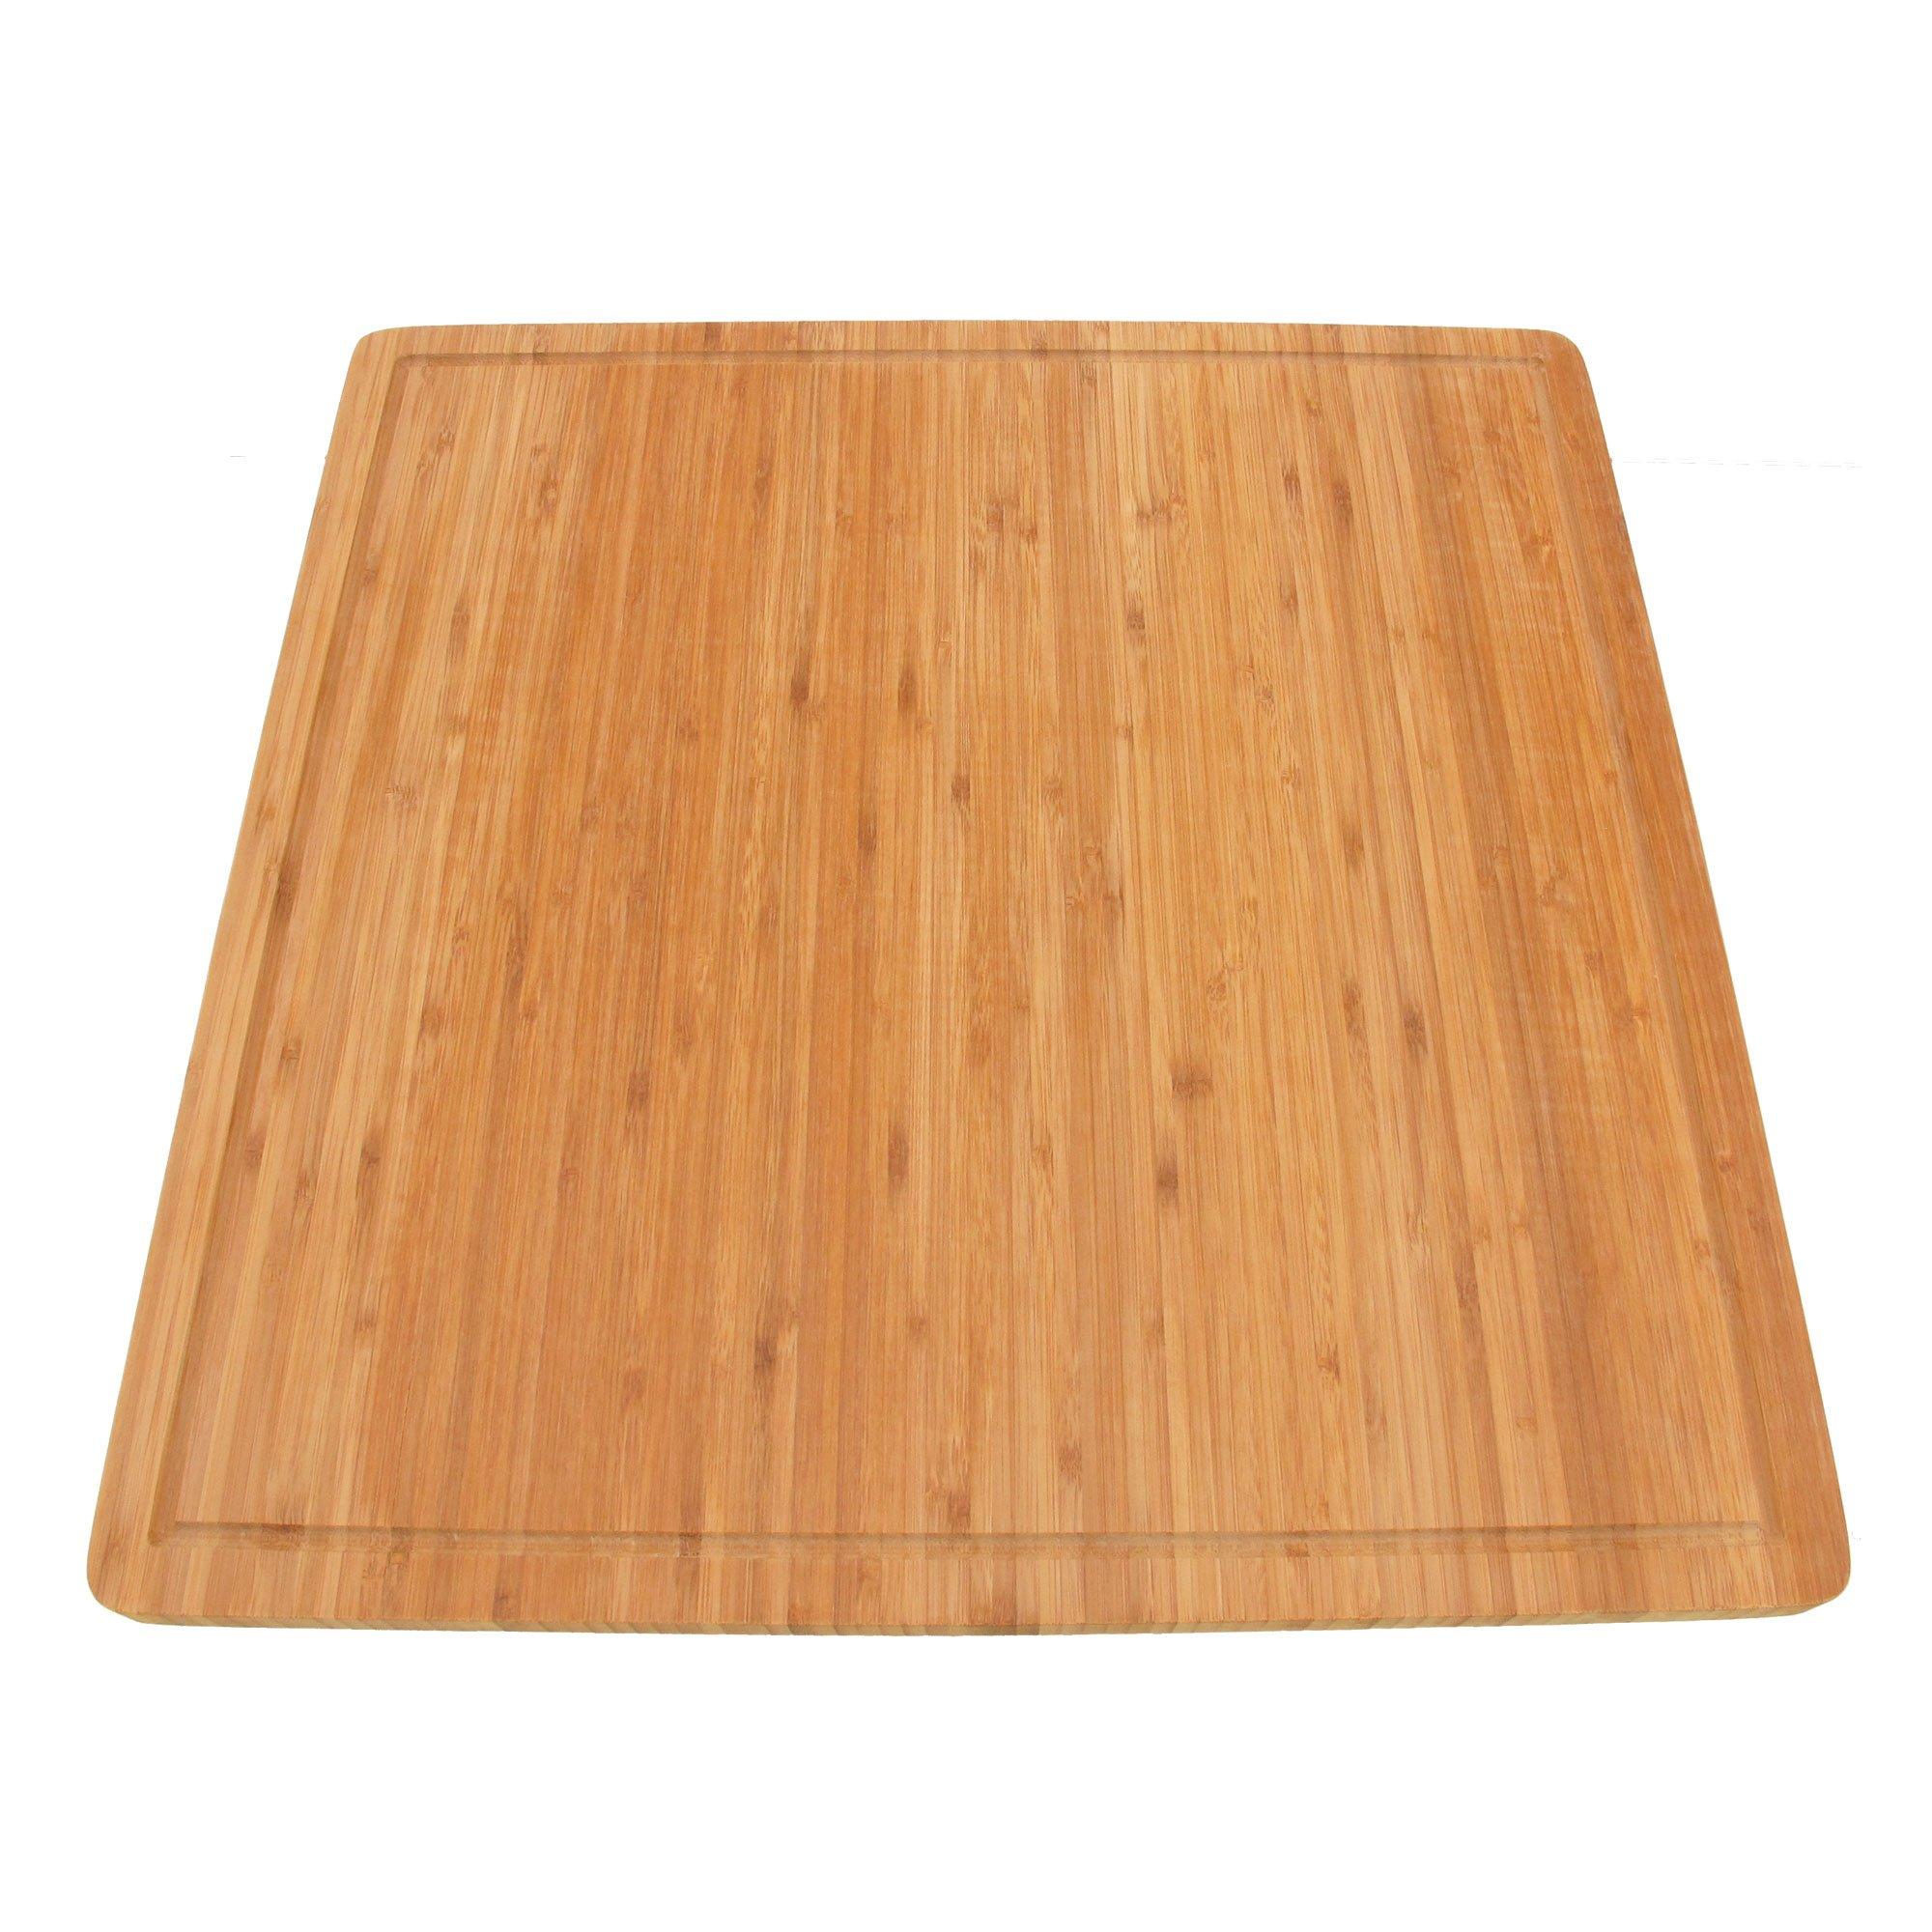 BambooMN Brand - Bamboo Burner Cover Cutting Board, New Vertical Cut, Large, Square (19.8''x19.8''x0.75'')